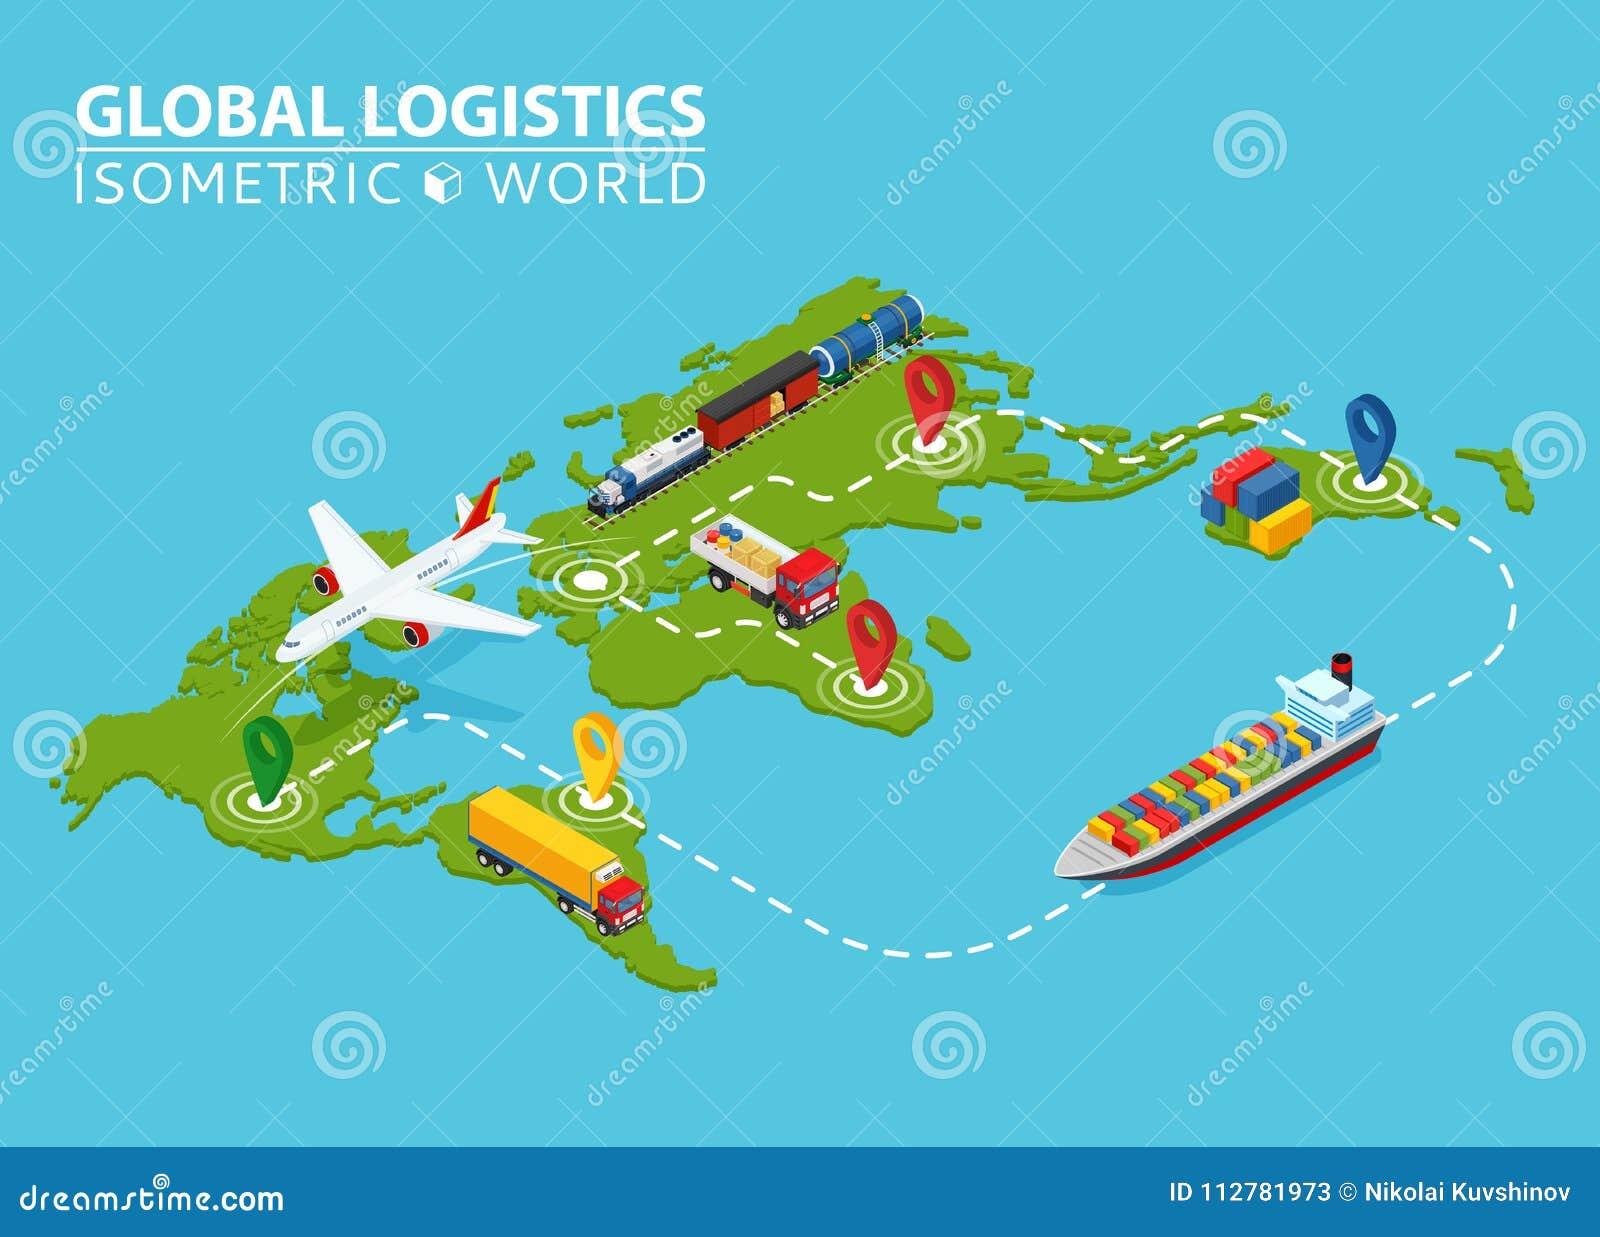 Global Logistic Isometric Vehicle Infographic  Ship Cargo